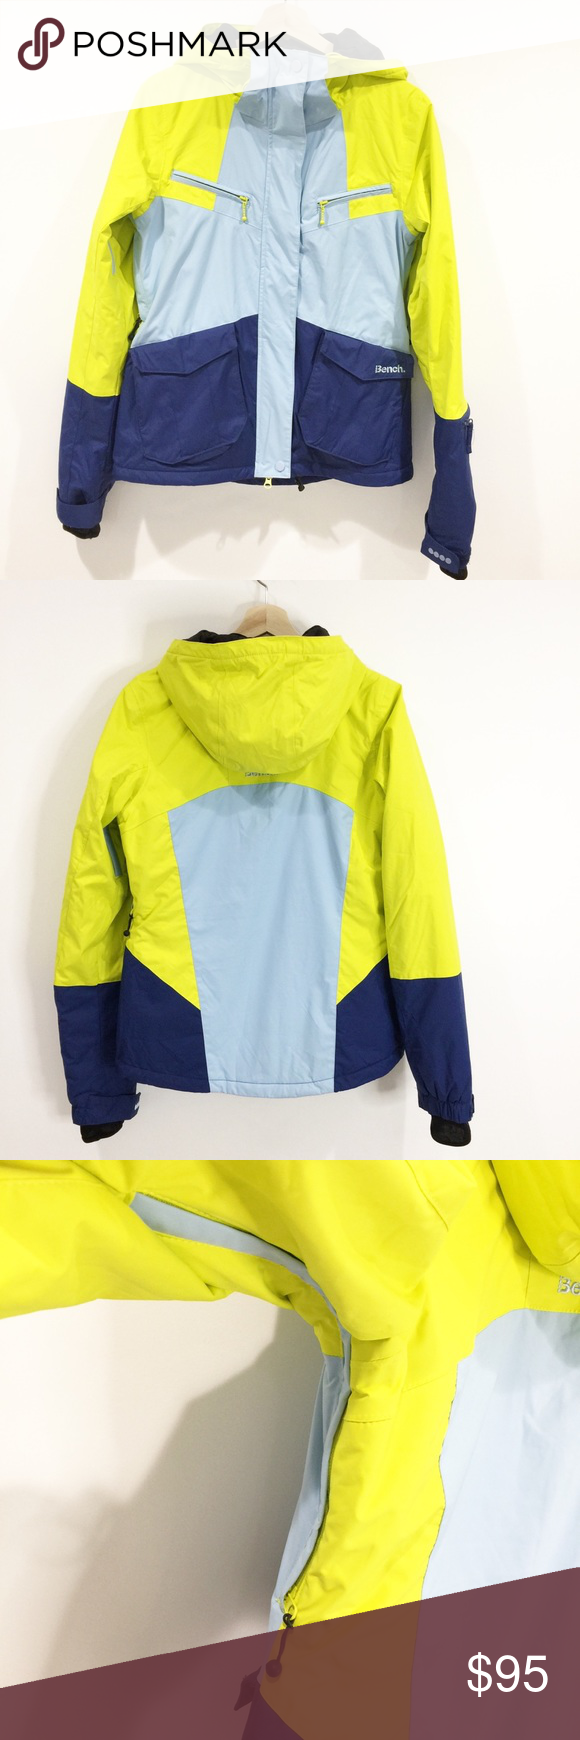 Bench Ski Snowboard Snow Jacket Sz Medium Nwt Bench Jackets Snow Jacket Jackets [ 1740 x 580 Pixel ]